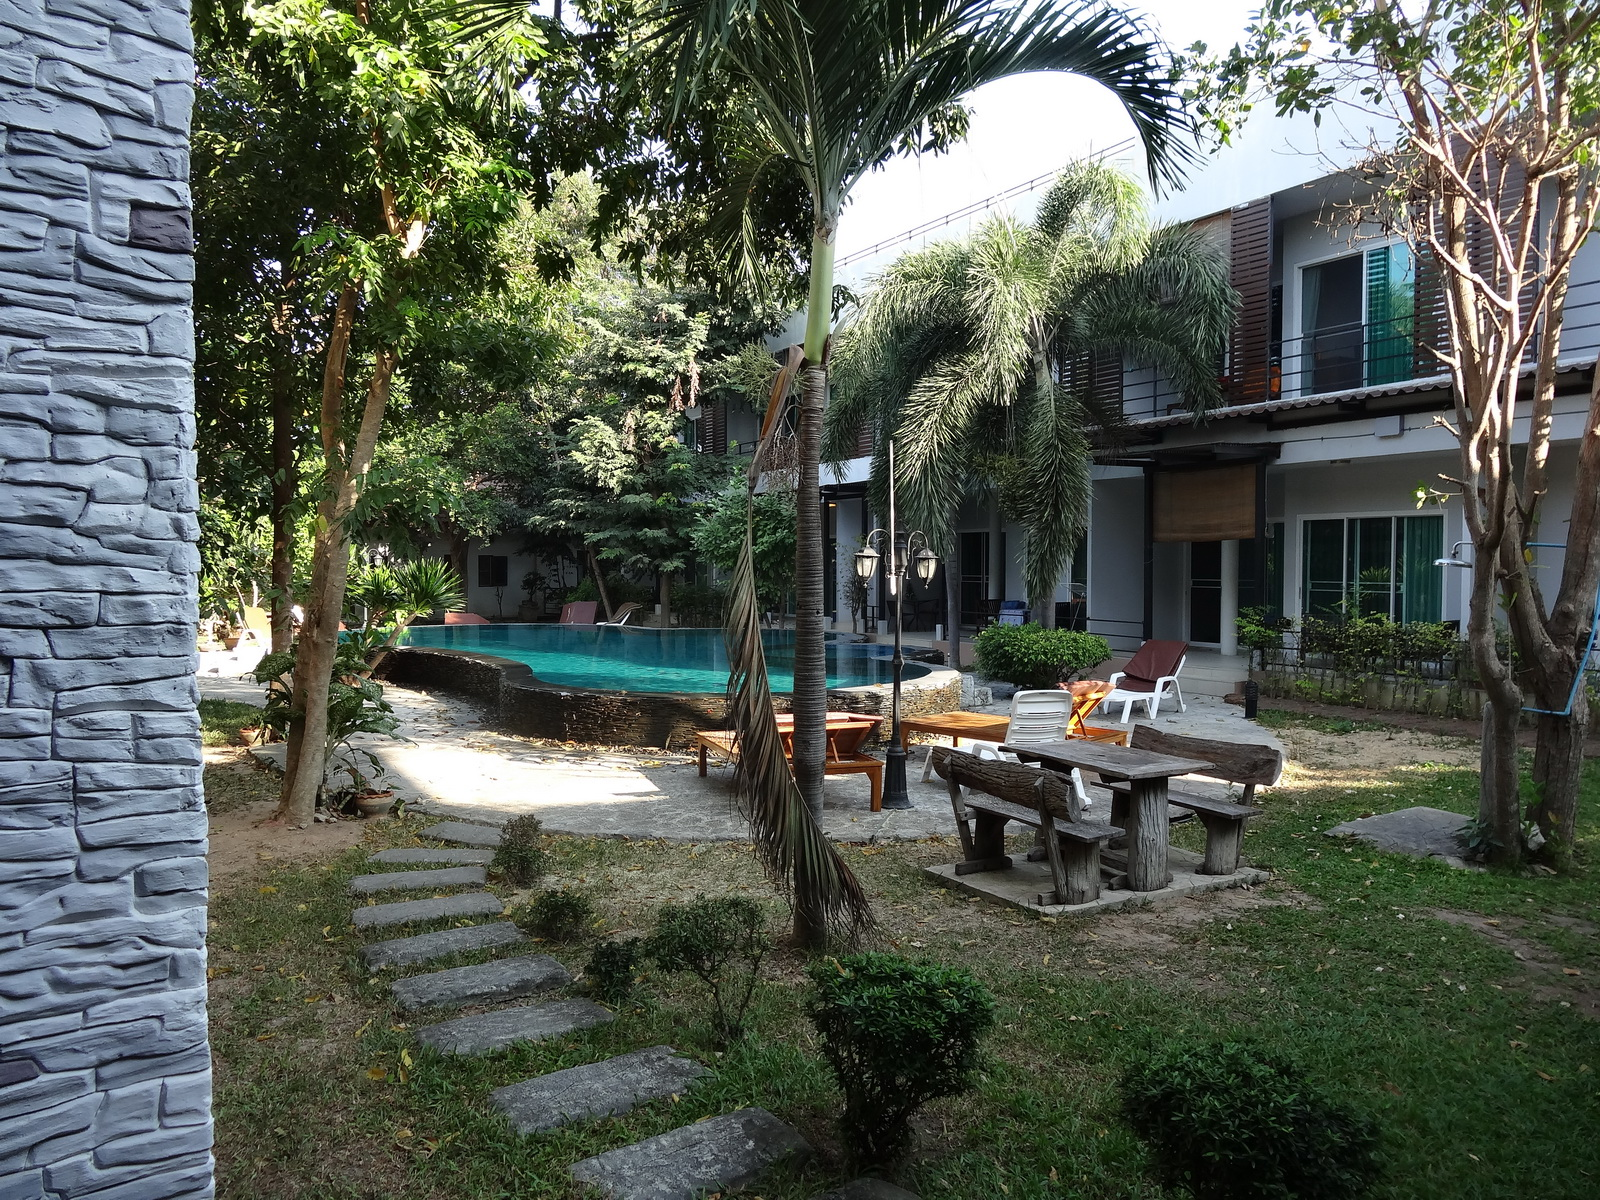 20 Pattaya 362